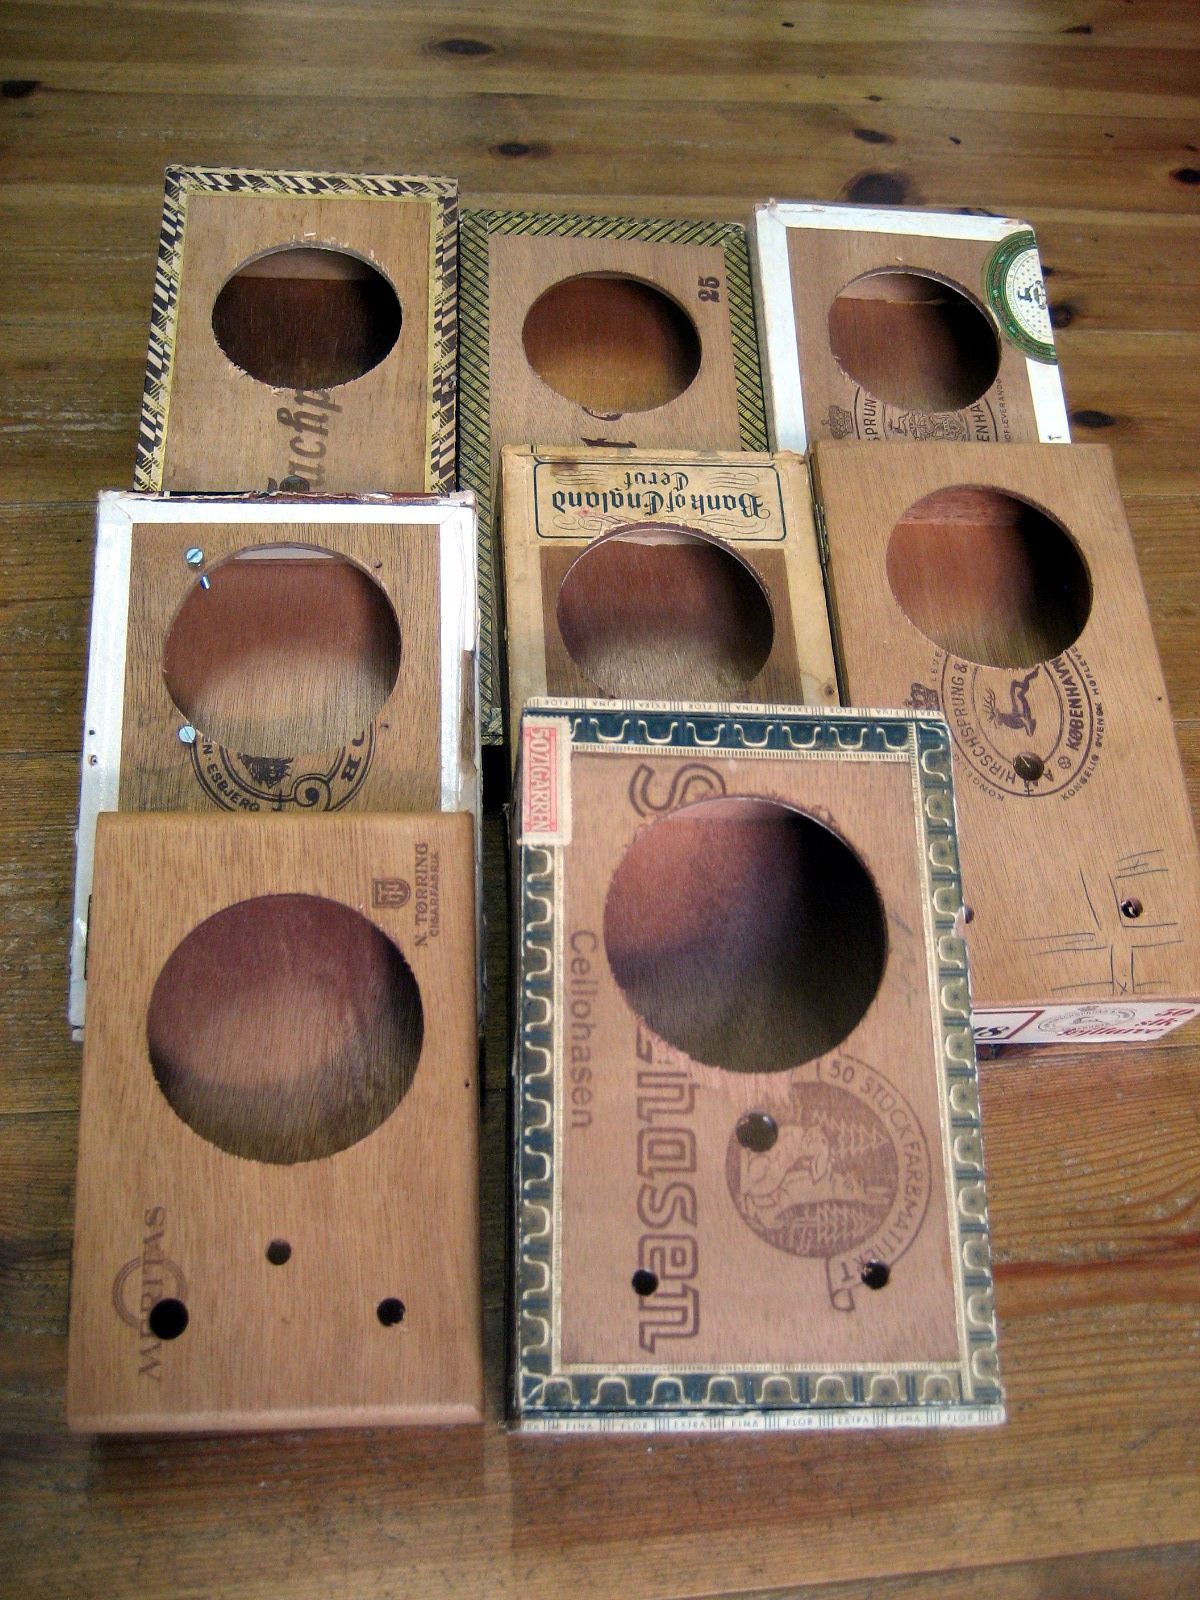 77mm-boxes-400x533.jpg